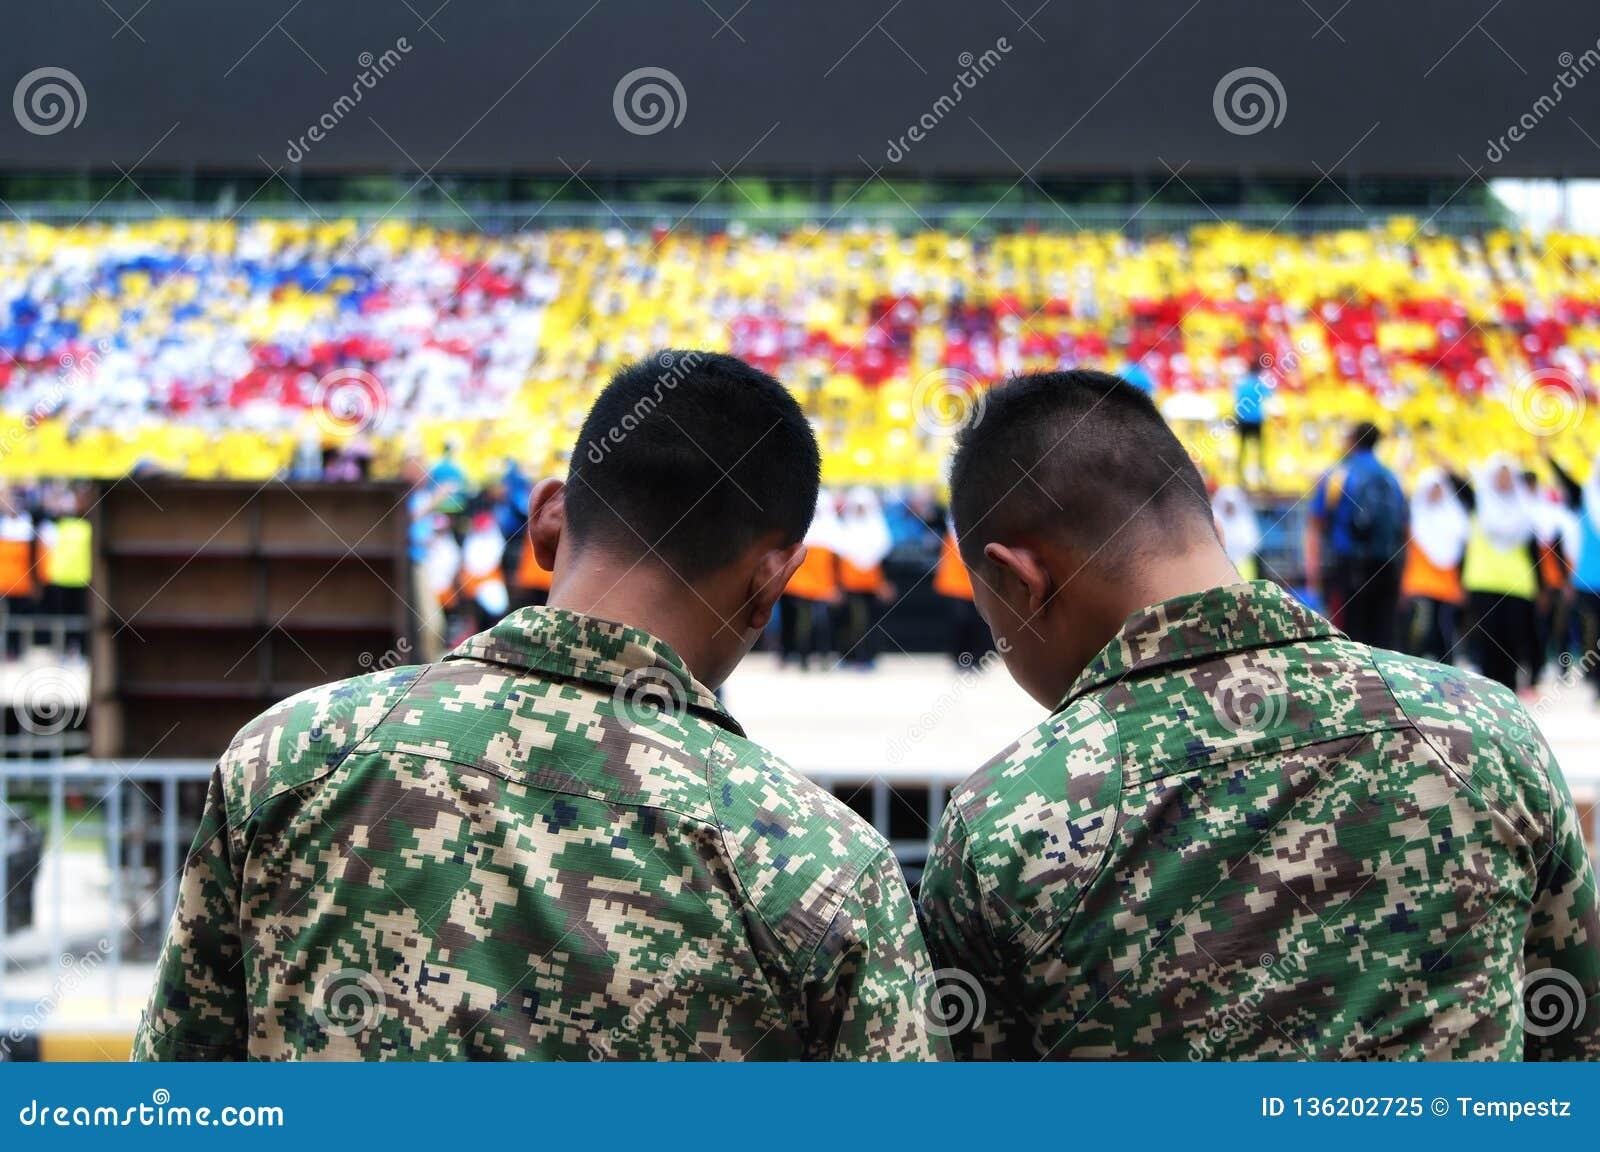 Malaysian army men watching students practicing for Hari Merdeka in Malaysia, Kuala Lumpur